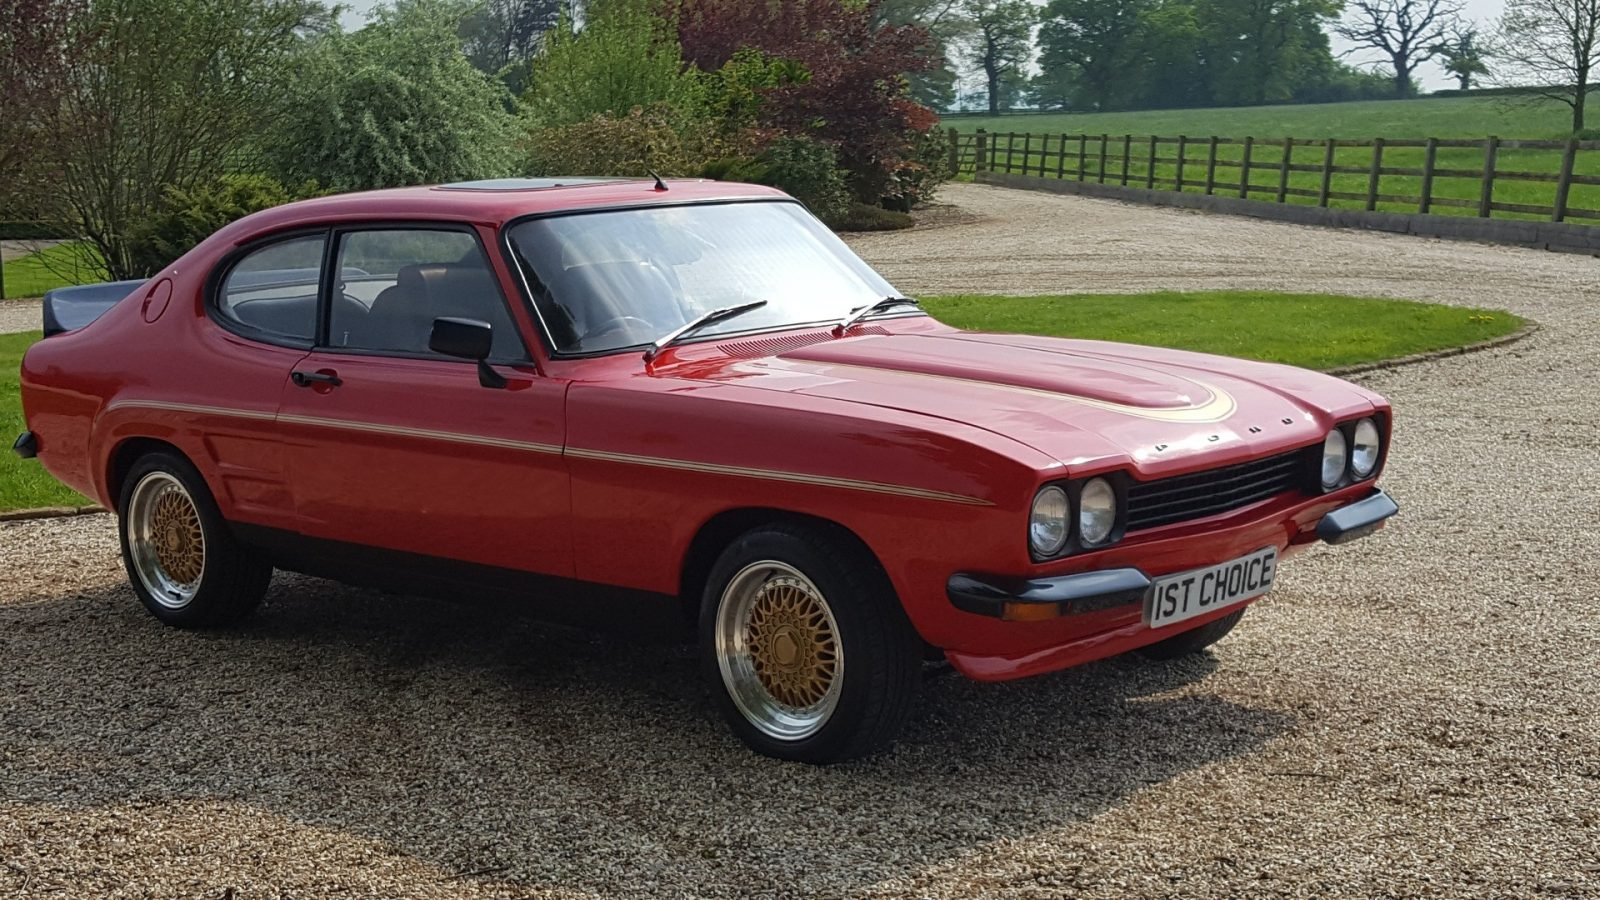 1972 Ford Capri (Red)